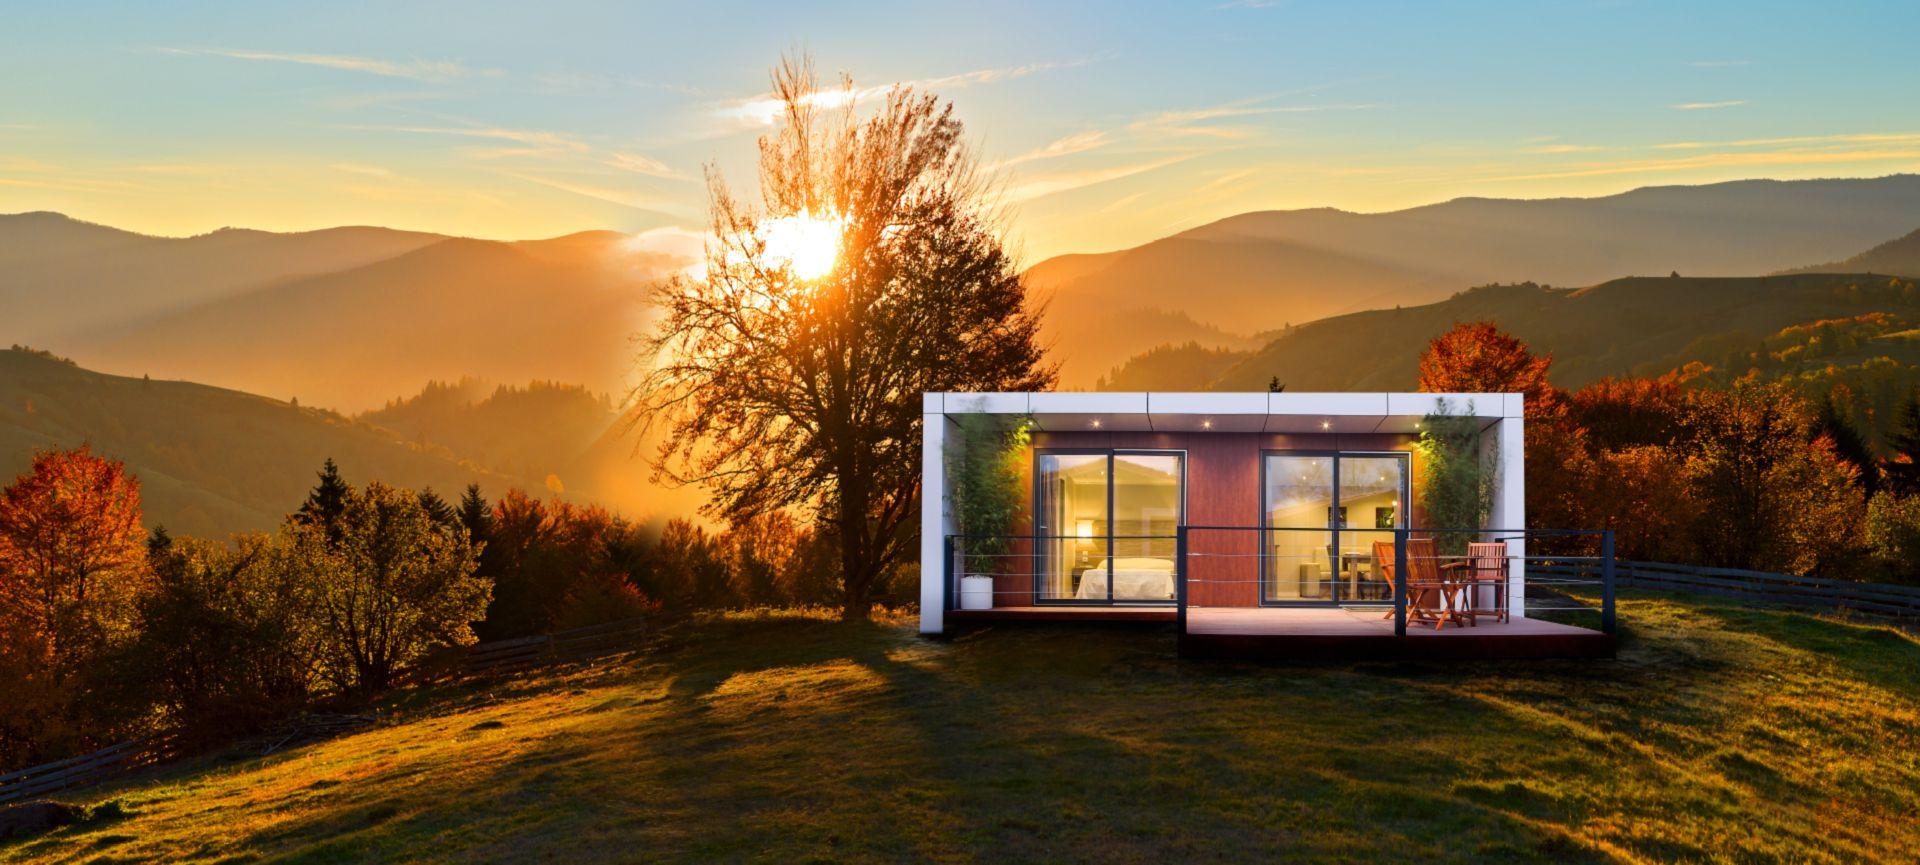 Casas prefabricadas modulares economicas y modernas eurocasa - Bungalows de madera prefabricadas precios ...